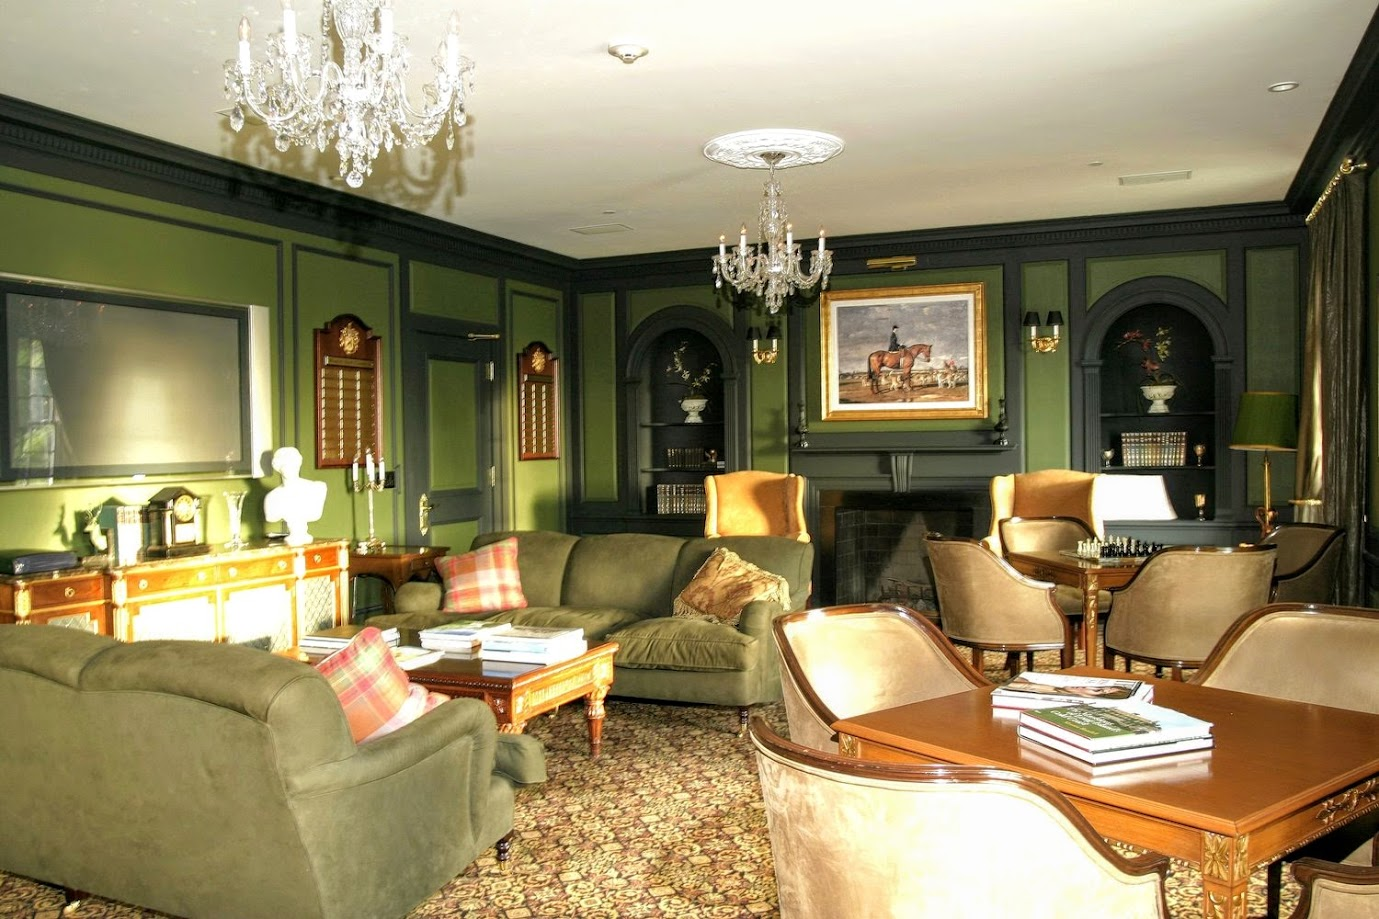 cote de texas president trump s new jersey white house. Black Bedroom Furniture Sets. Home Design Ideas